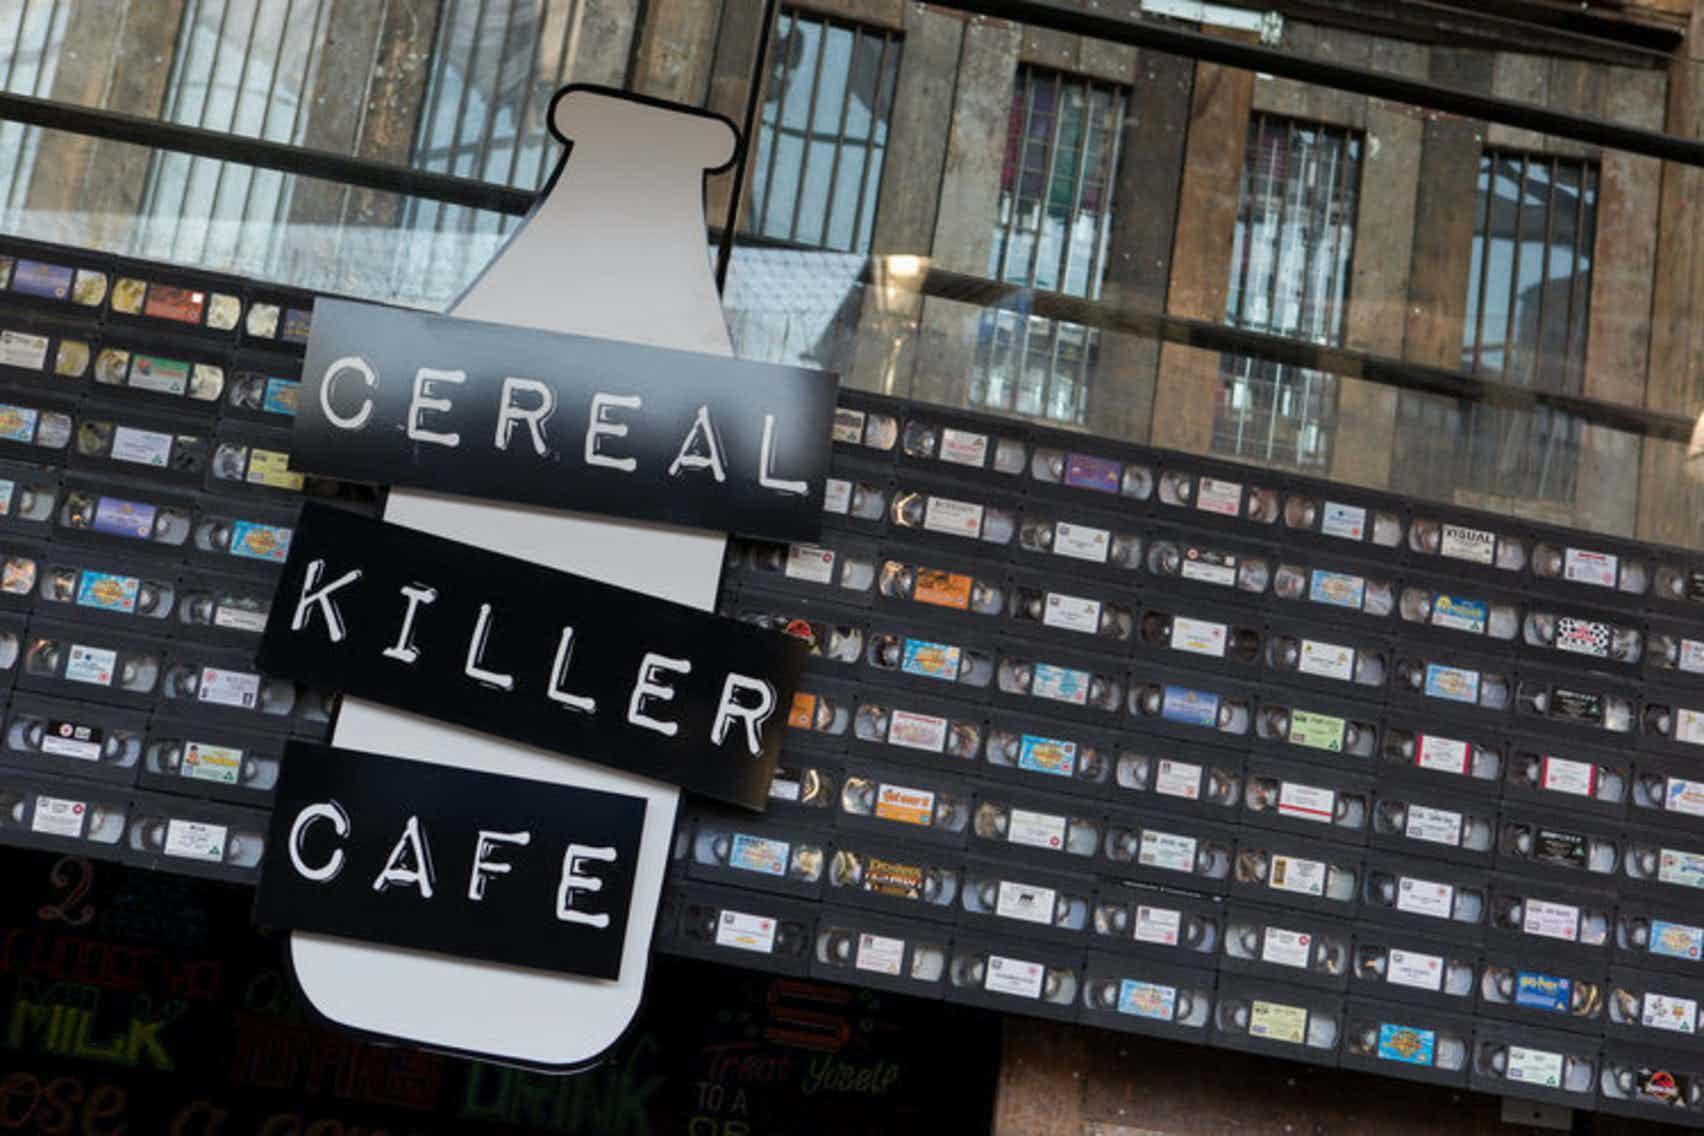 Camden Branch, Cereal Killer Cafe